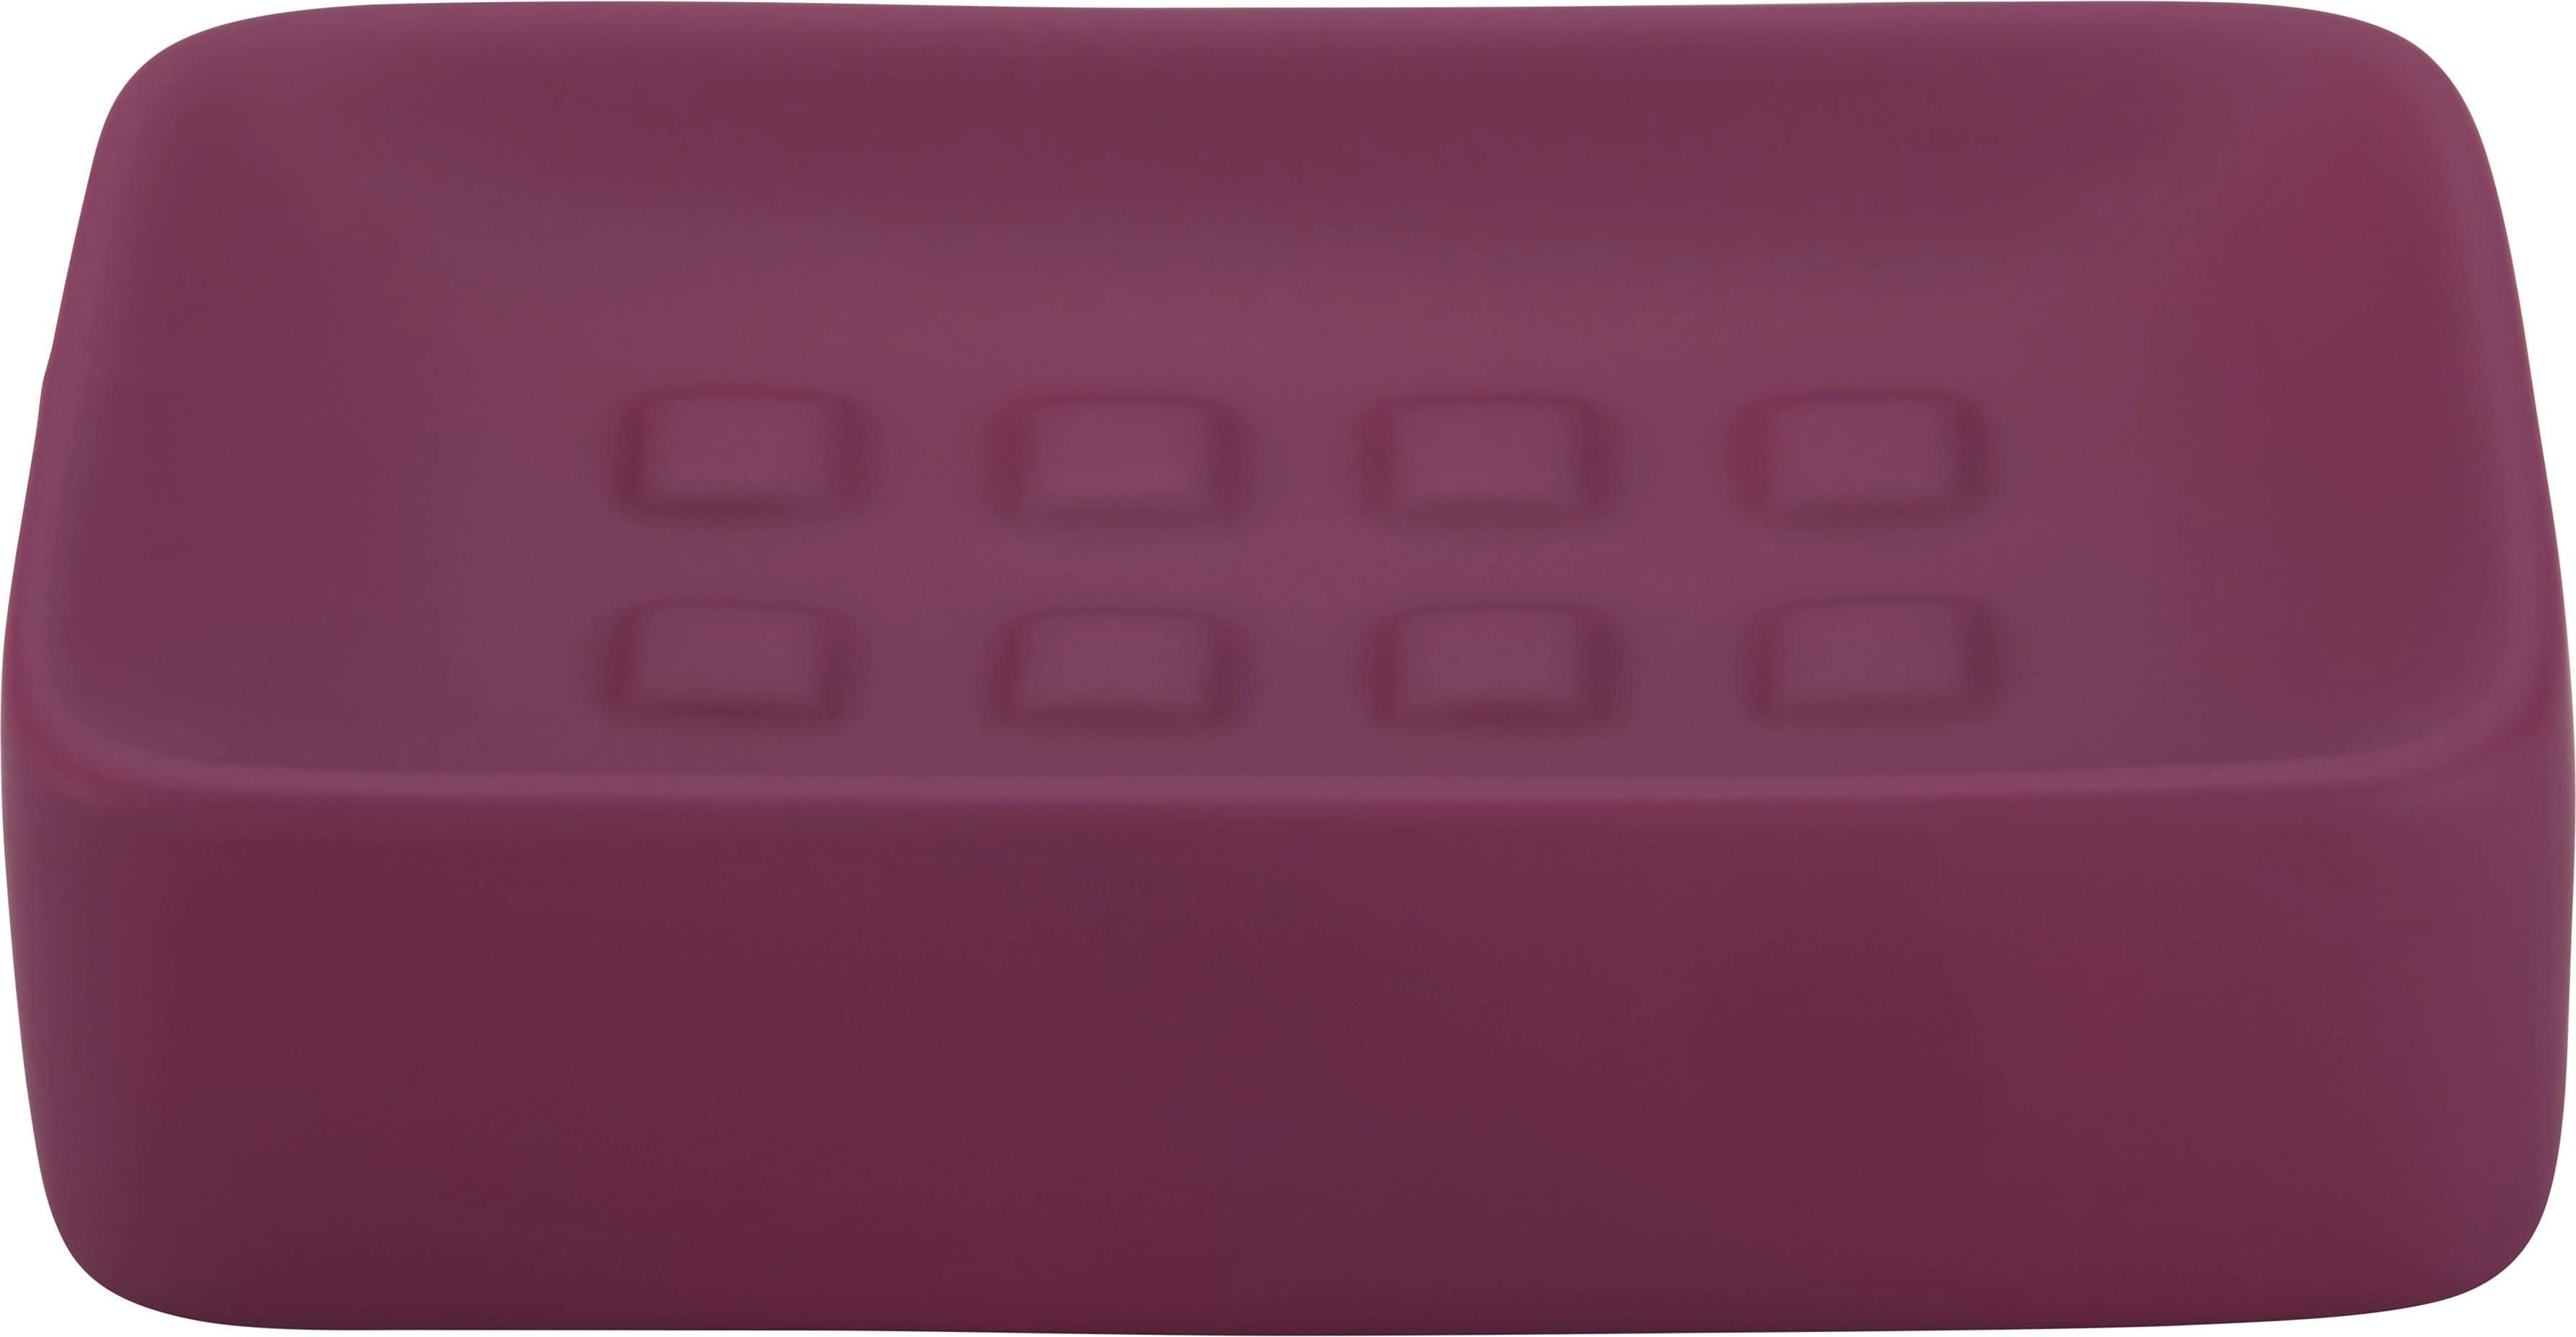 Seifenschale Melanie In Fuchsia aus Keramik - Lila, Keramik (8,3/12,5cm) - MÖMAX modern living